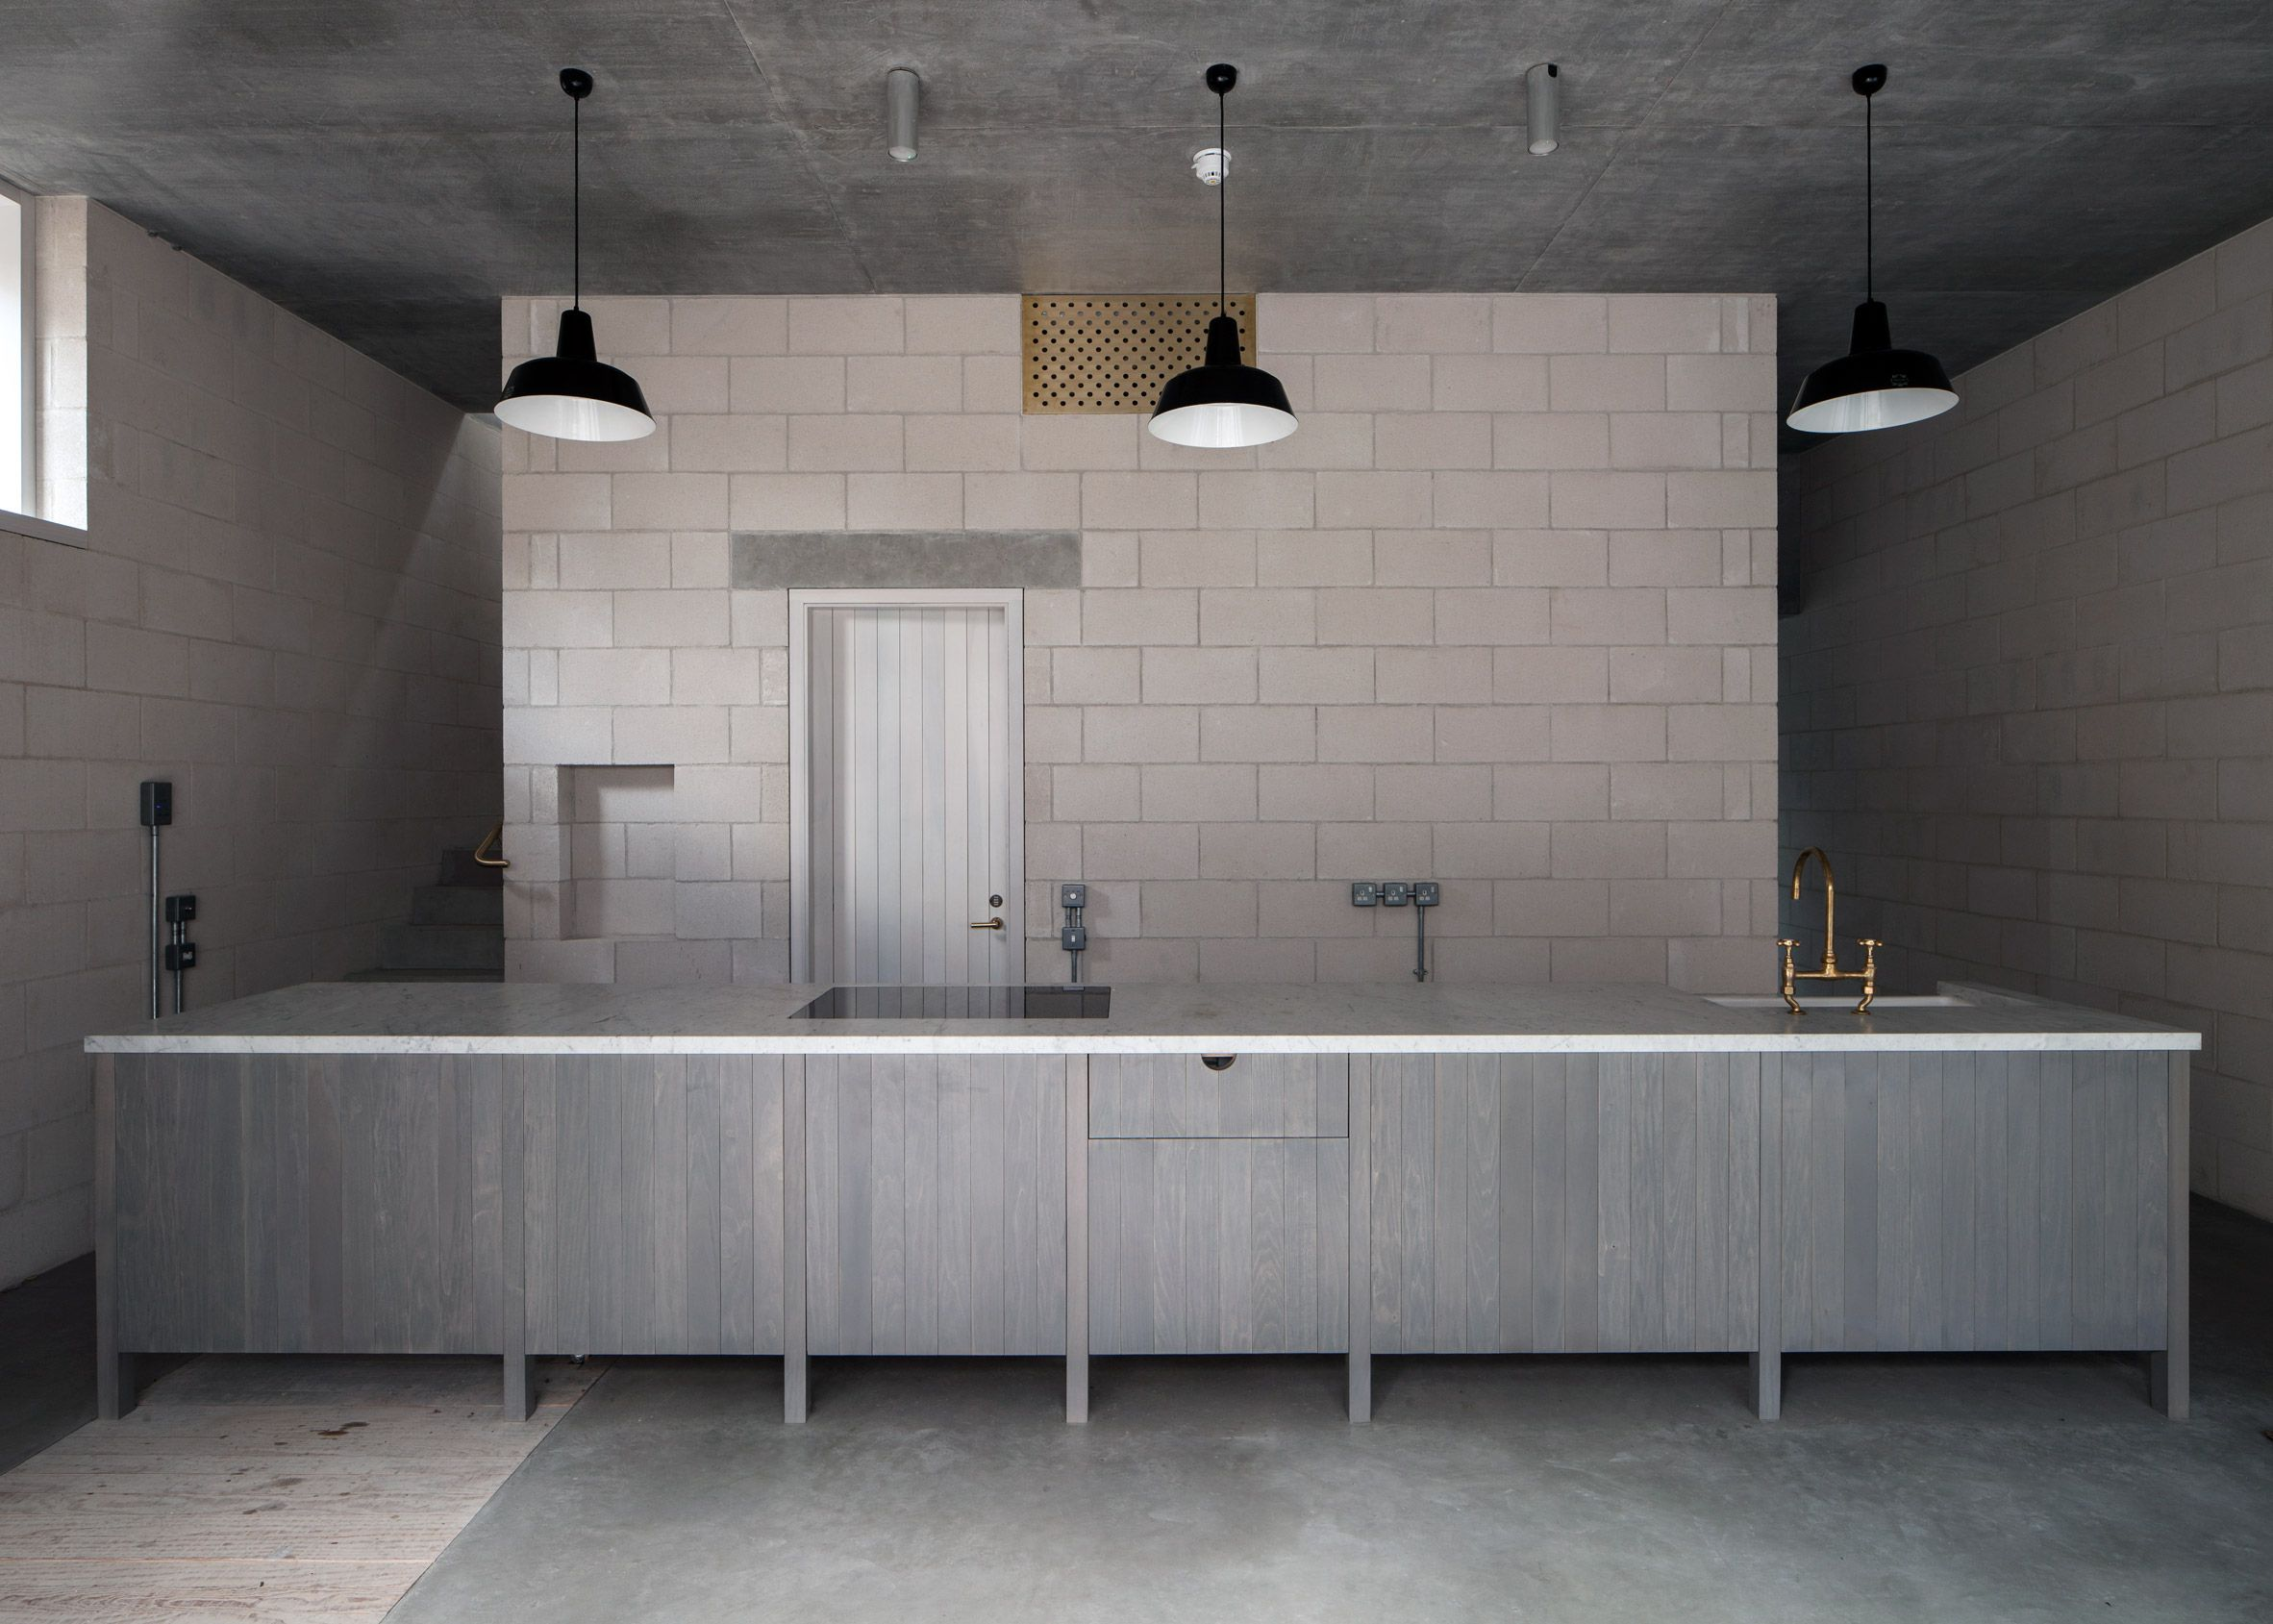 West London Kitchen Design 6a Architects Completes Concrete Photography  Studio For Juergen